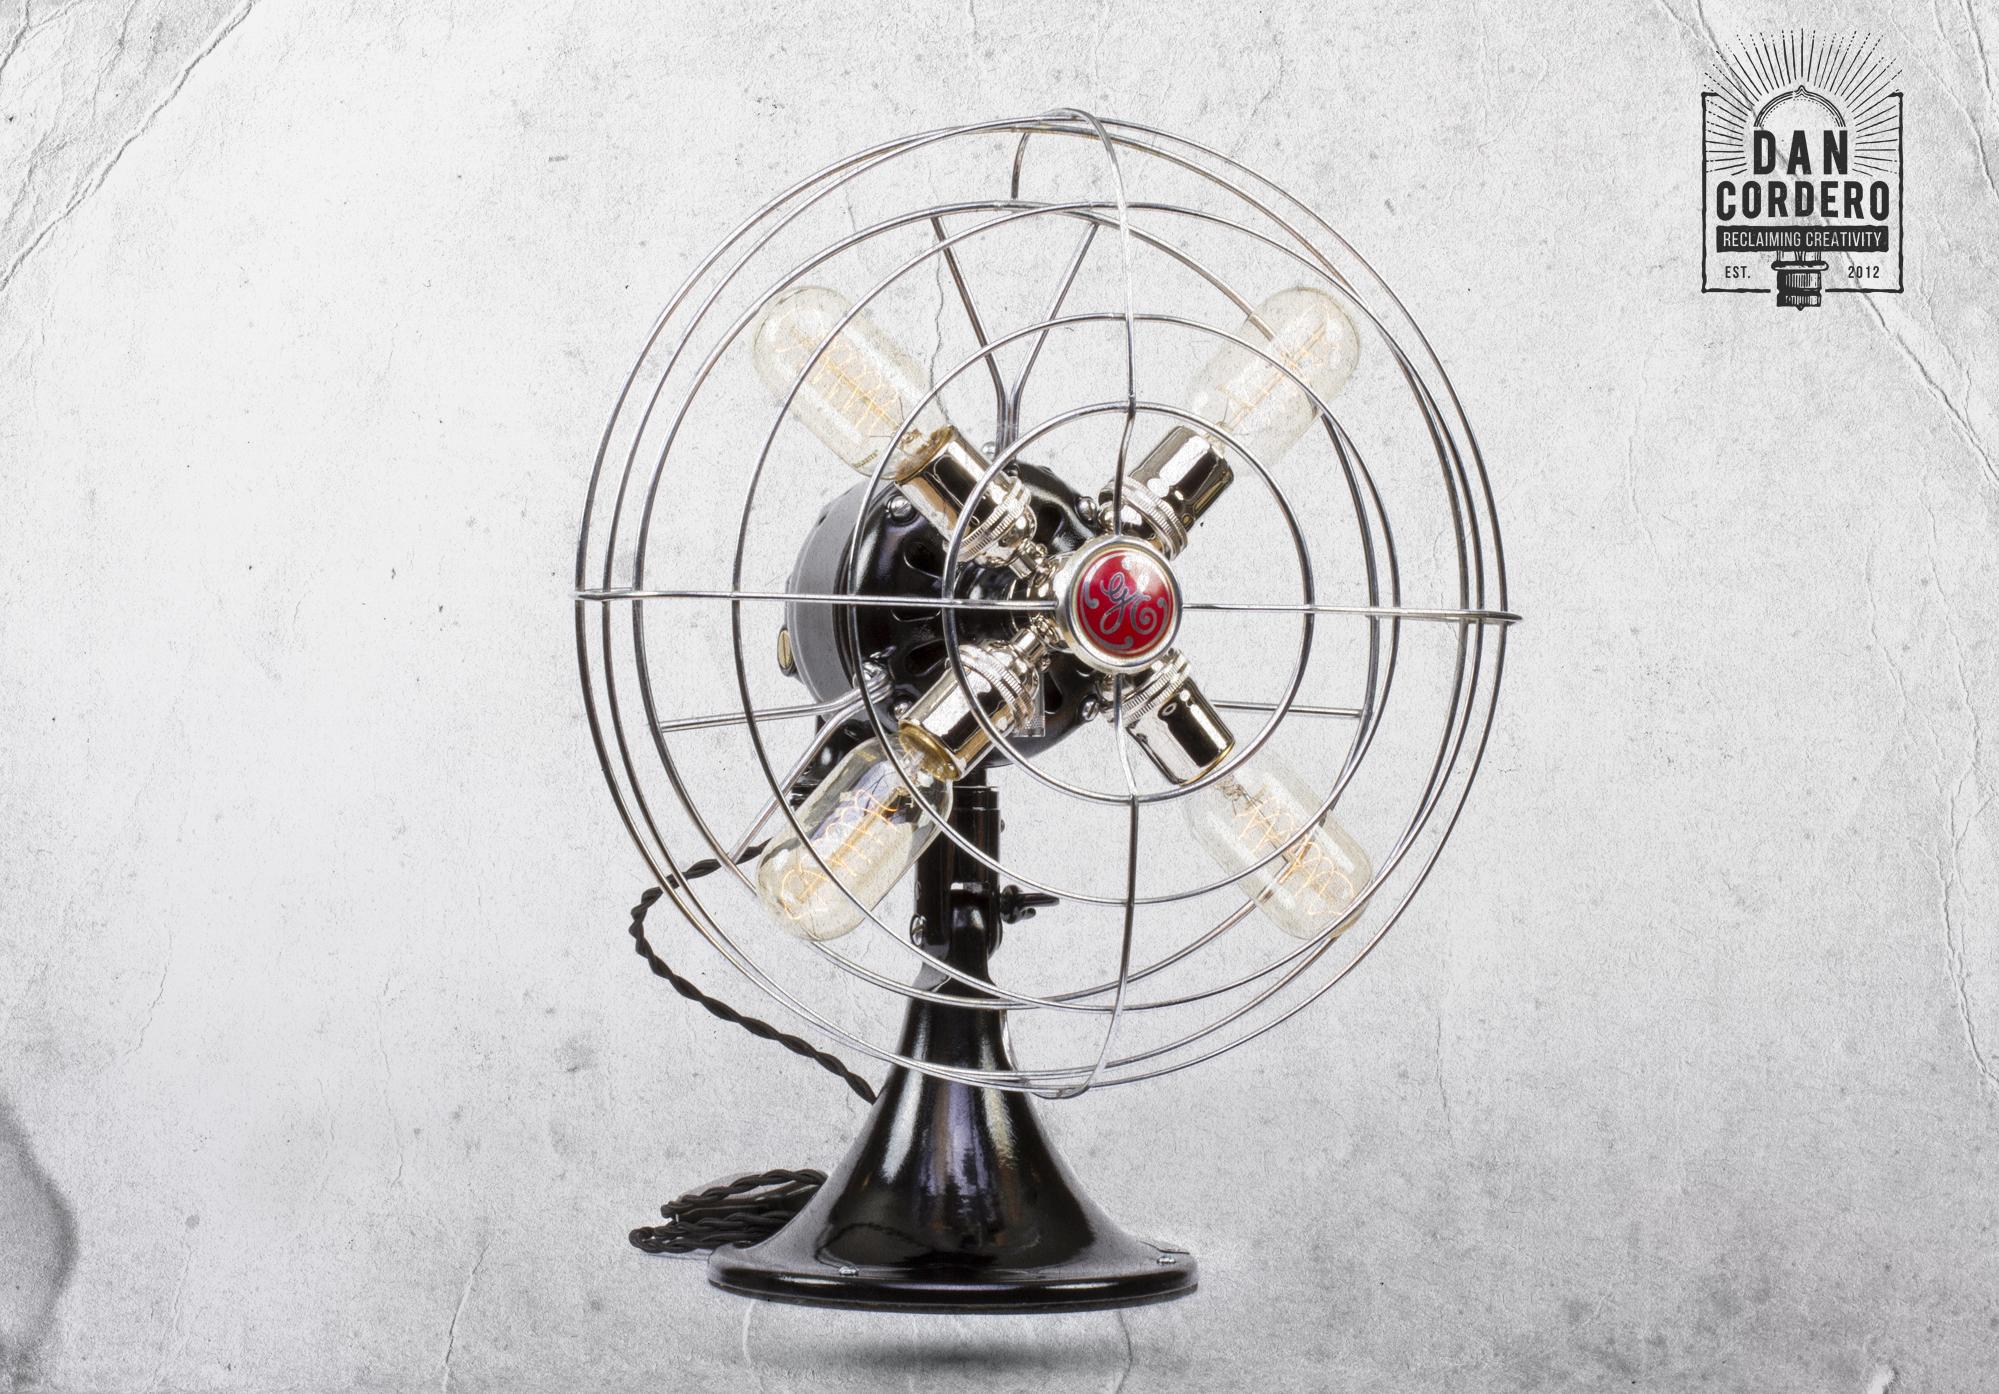 Fan Lamp Table Lamp Desk Lamp Steampunk 360˚ Product Spin